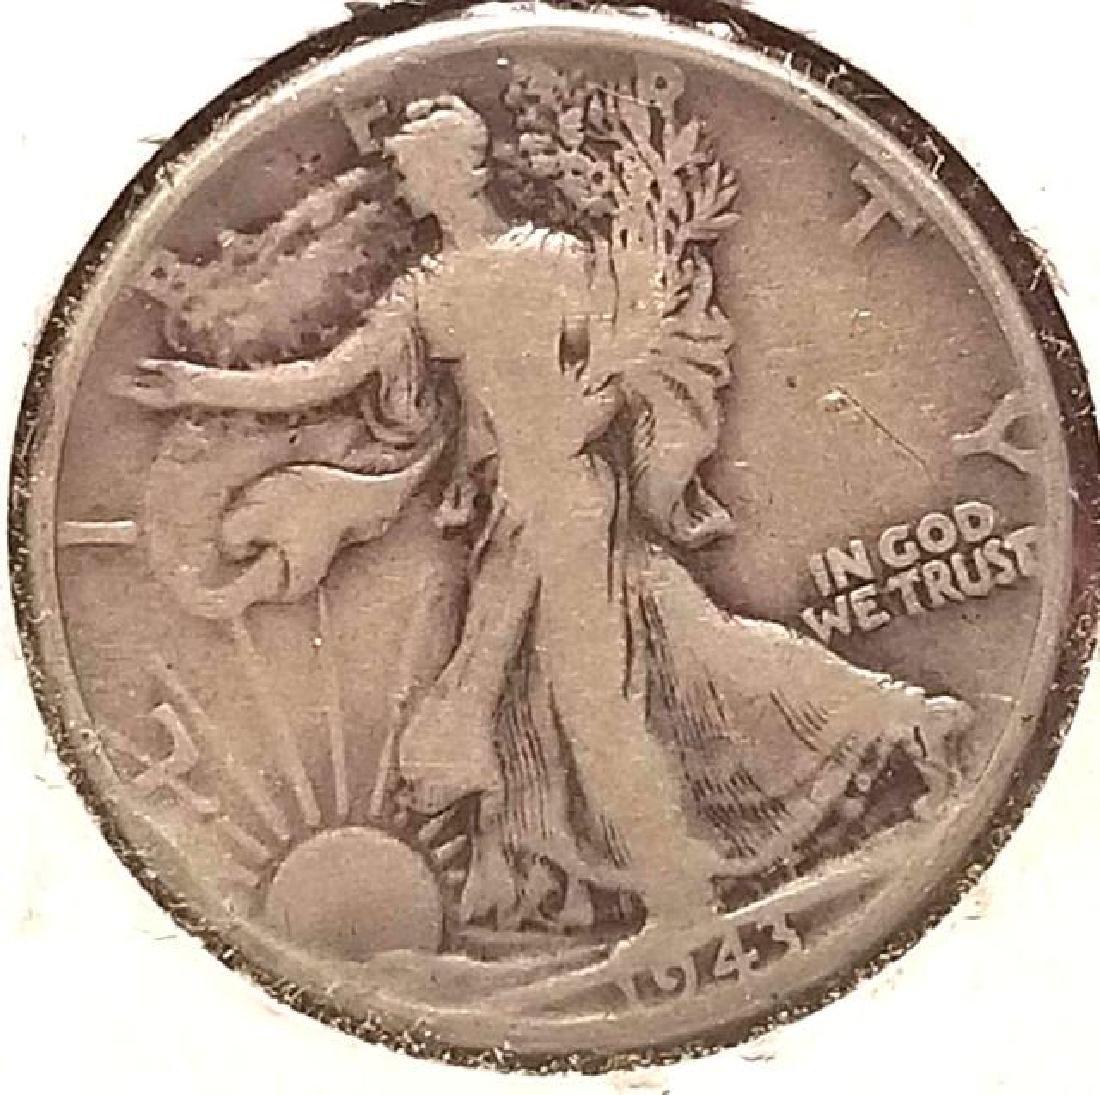 THREE (3) 1943 WALKING LIBERTY HALF DOLLARS - 3